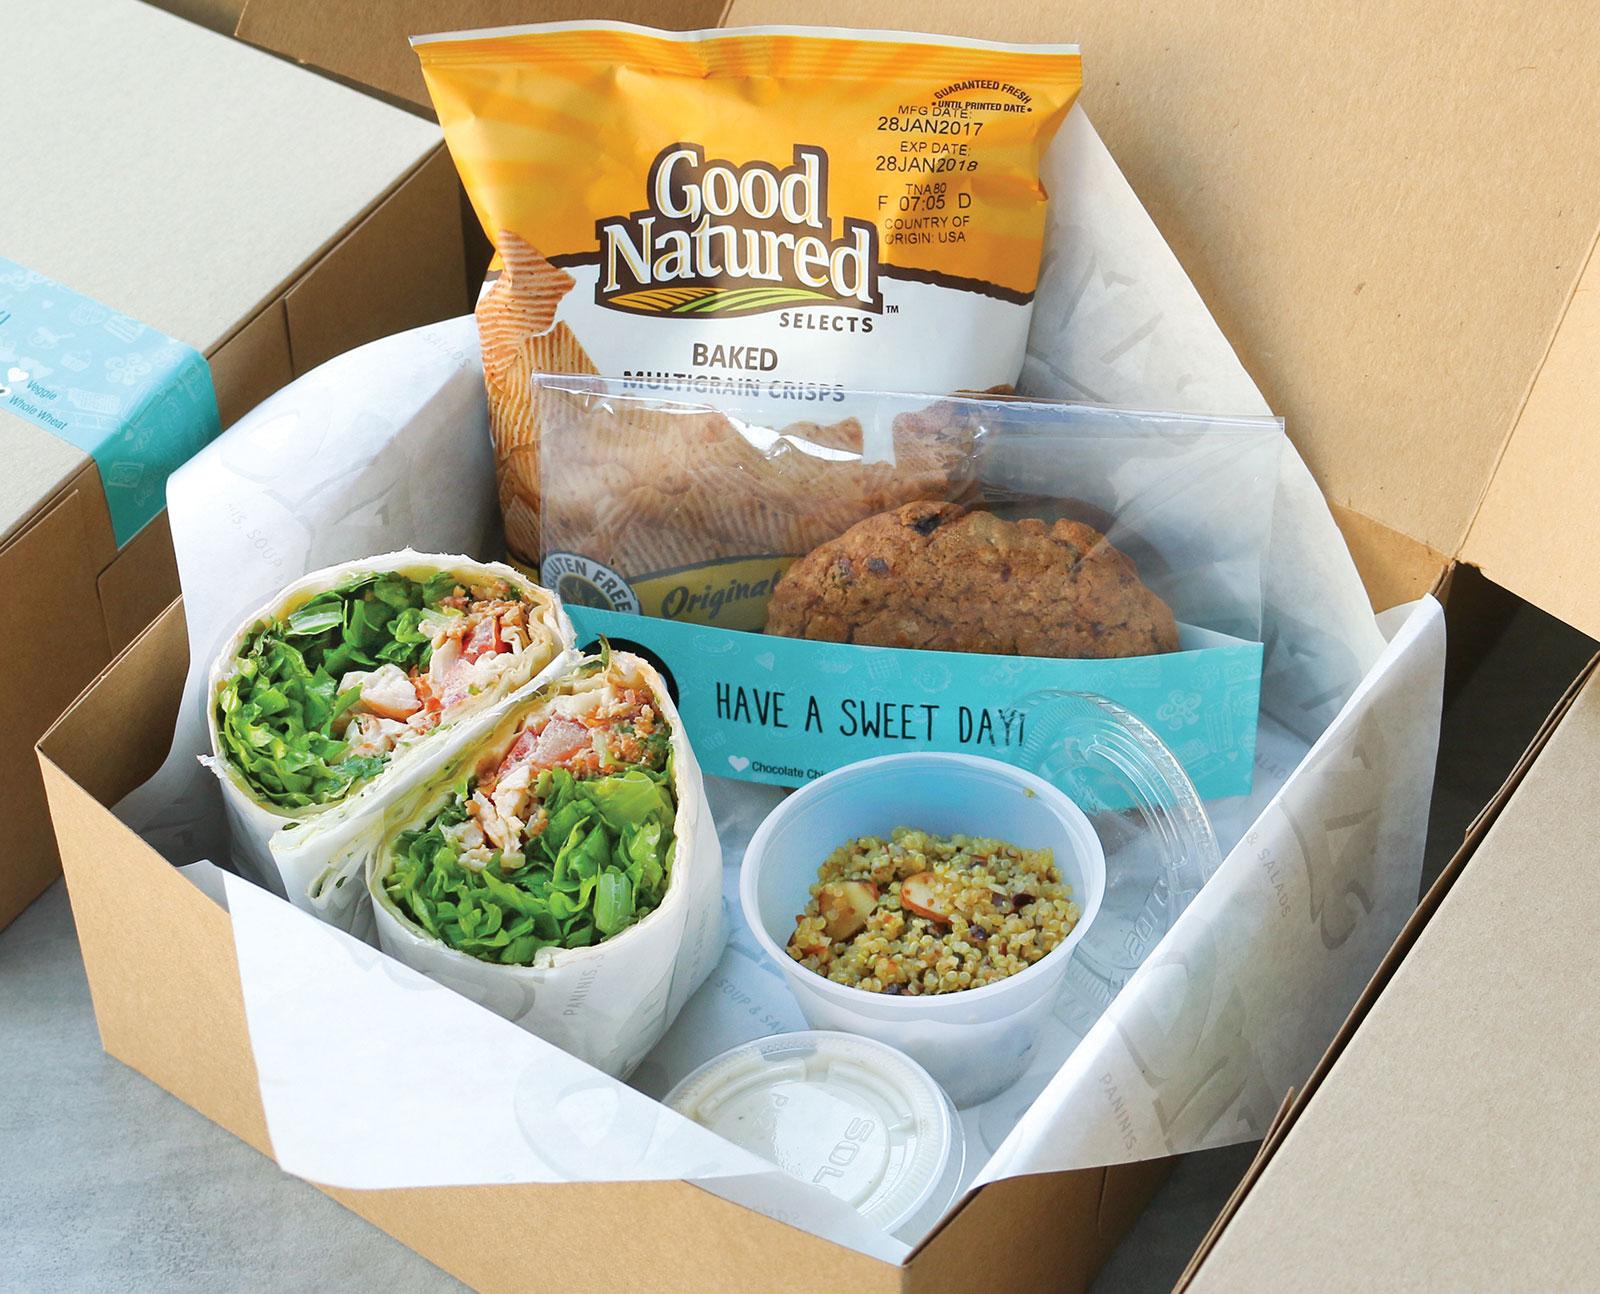 Wrap in a Box